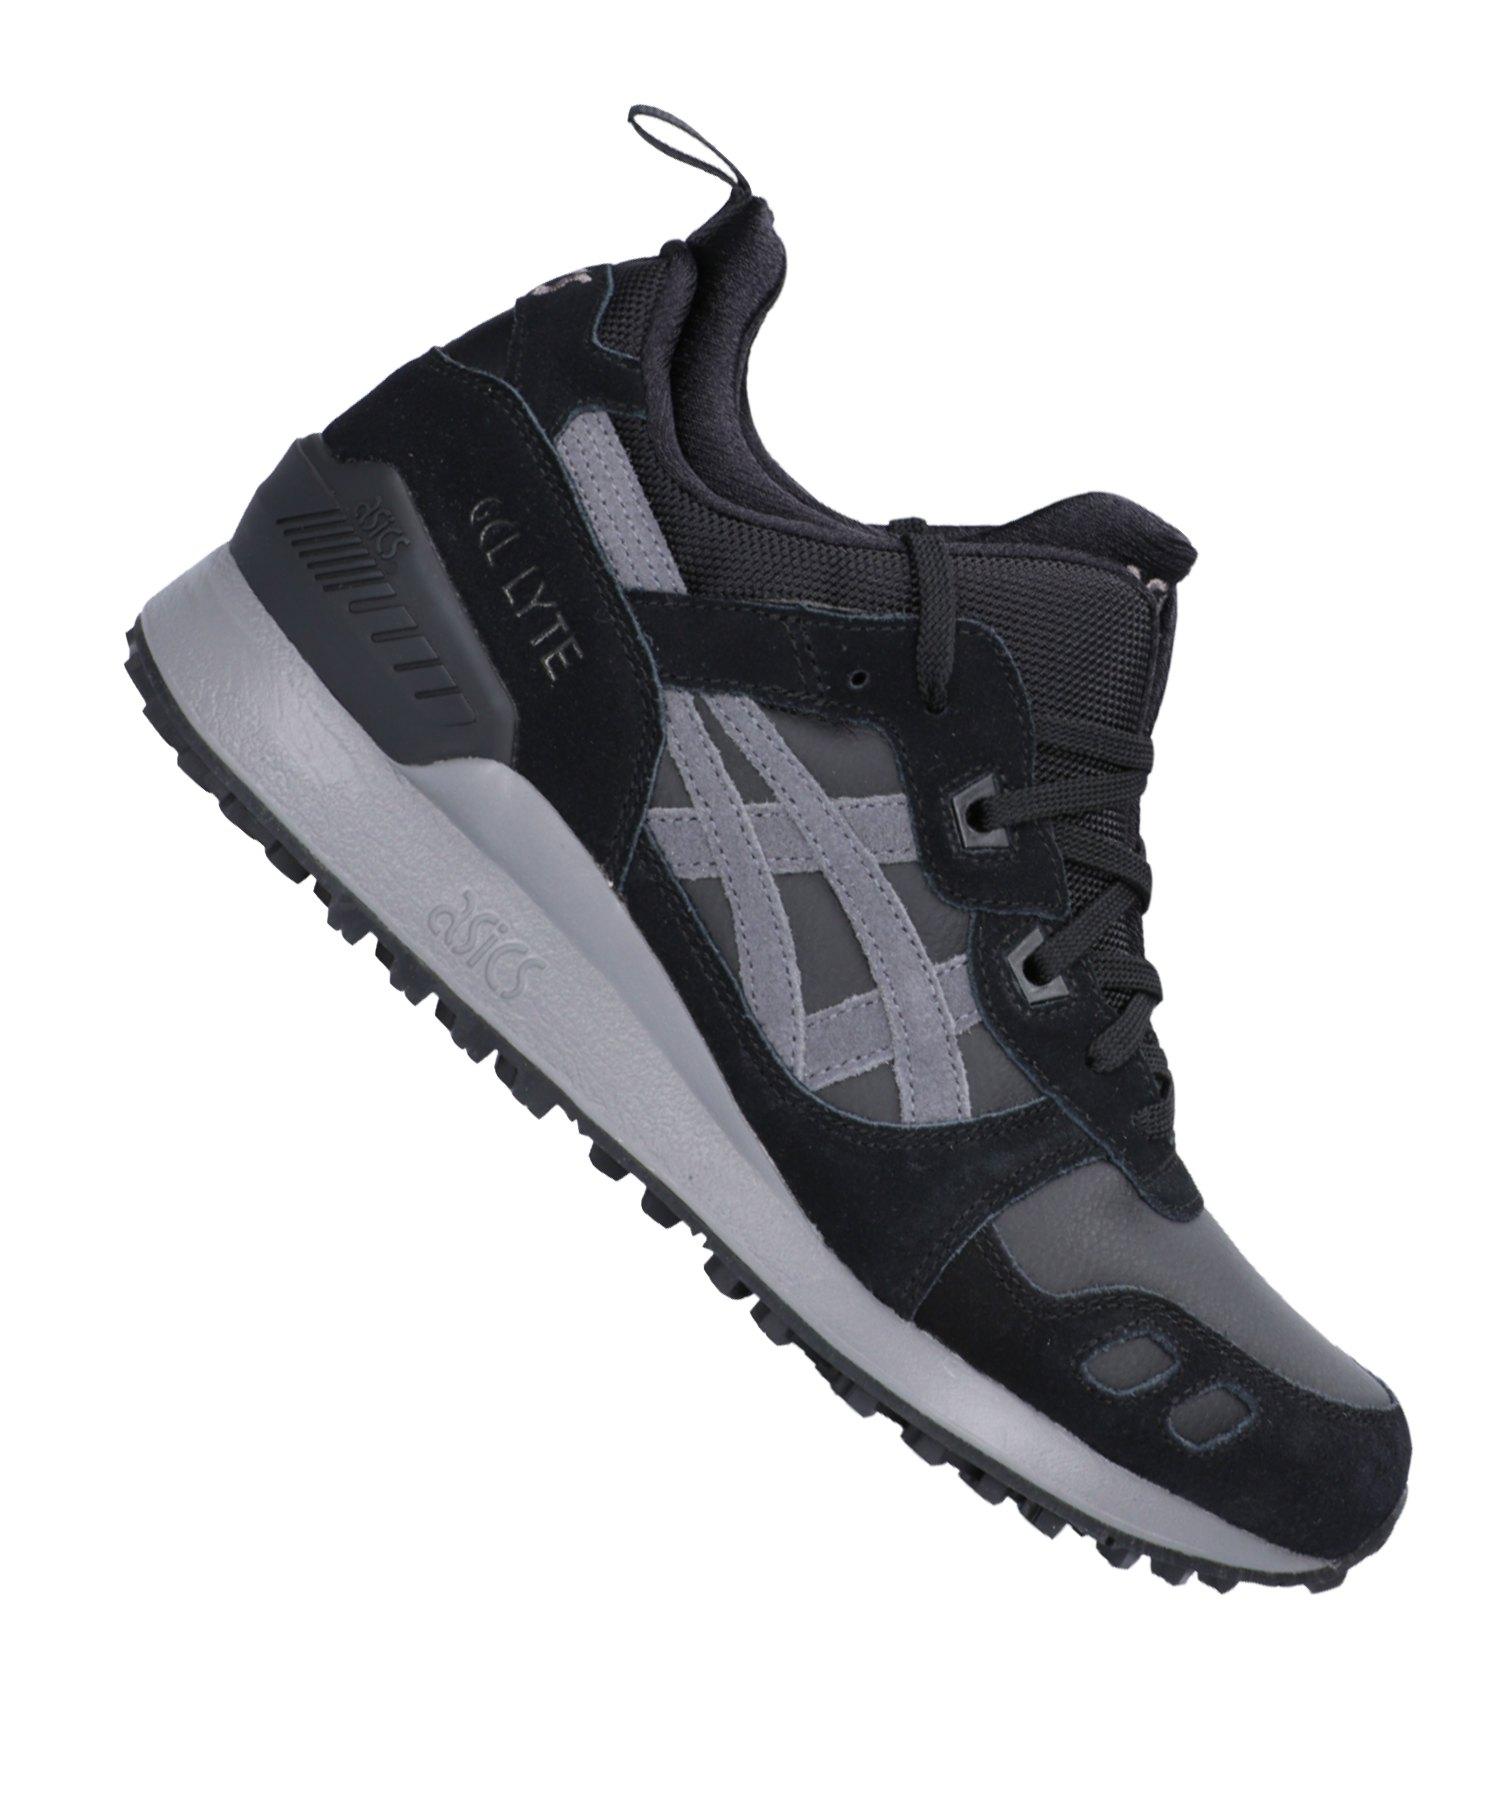 Asics Gel-Lyte MT Sneaker Boot Schwarz F001 - schwarz